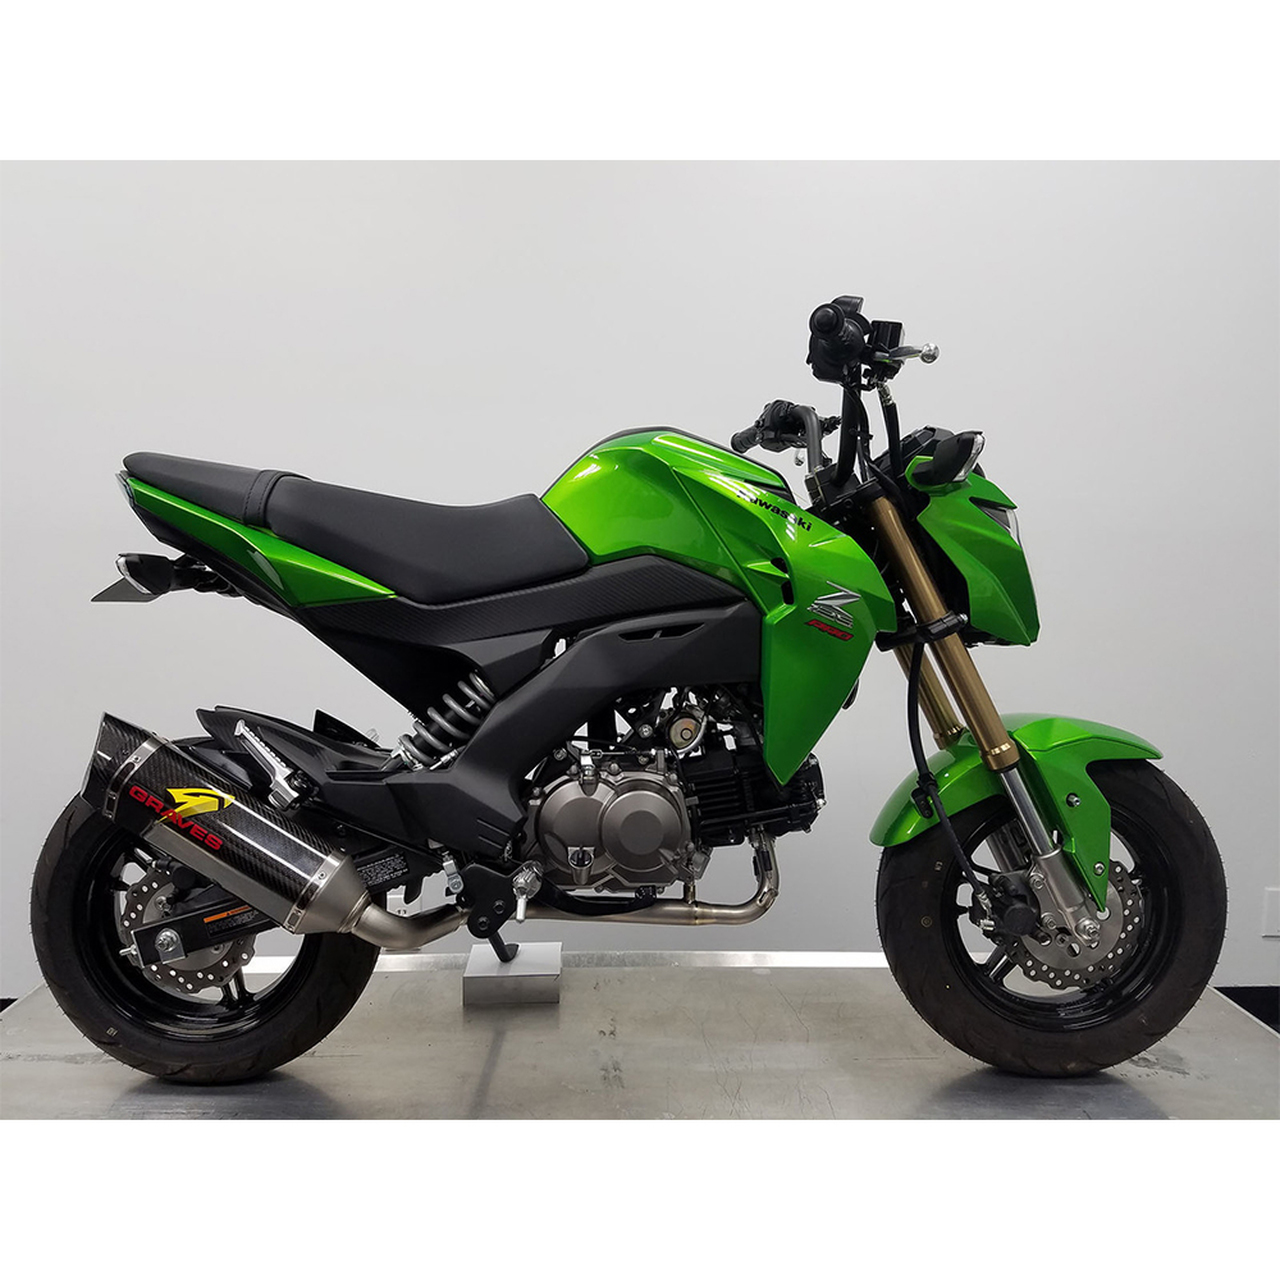 2017 Kawasaki Z125 Pro >> Graves Motorsports Kawasaki Z125 Pro 17 19 Full Exhaust System